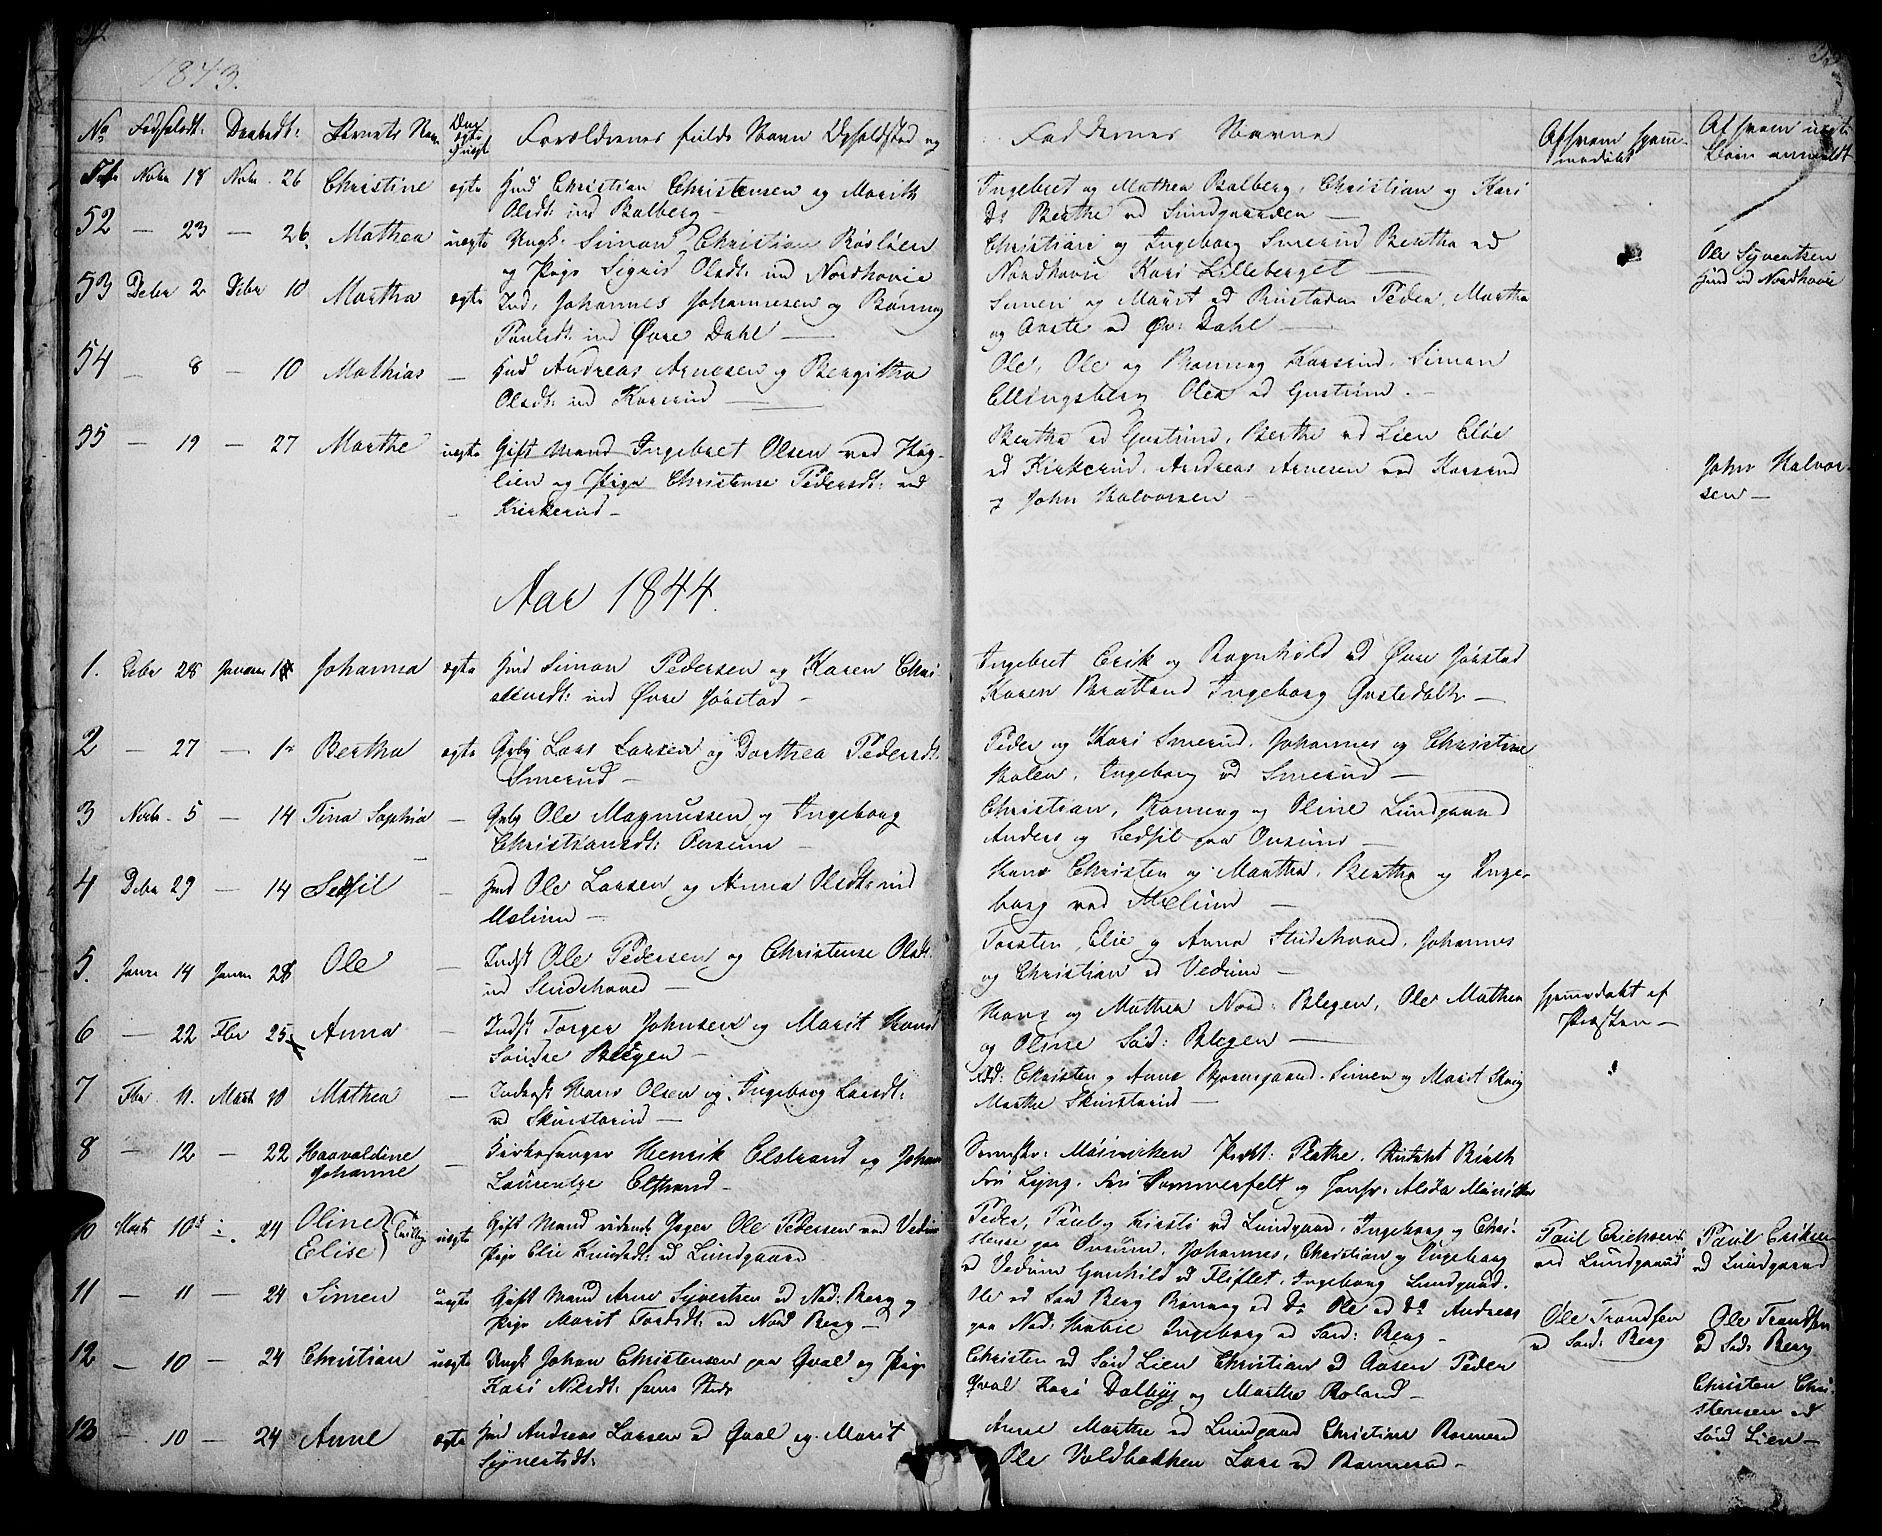 SAH, Fåberg prestekontor, Klokkerbok nr. 5, 1837-1864, s. 32-33